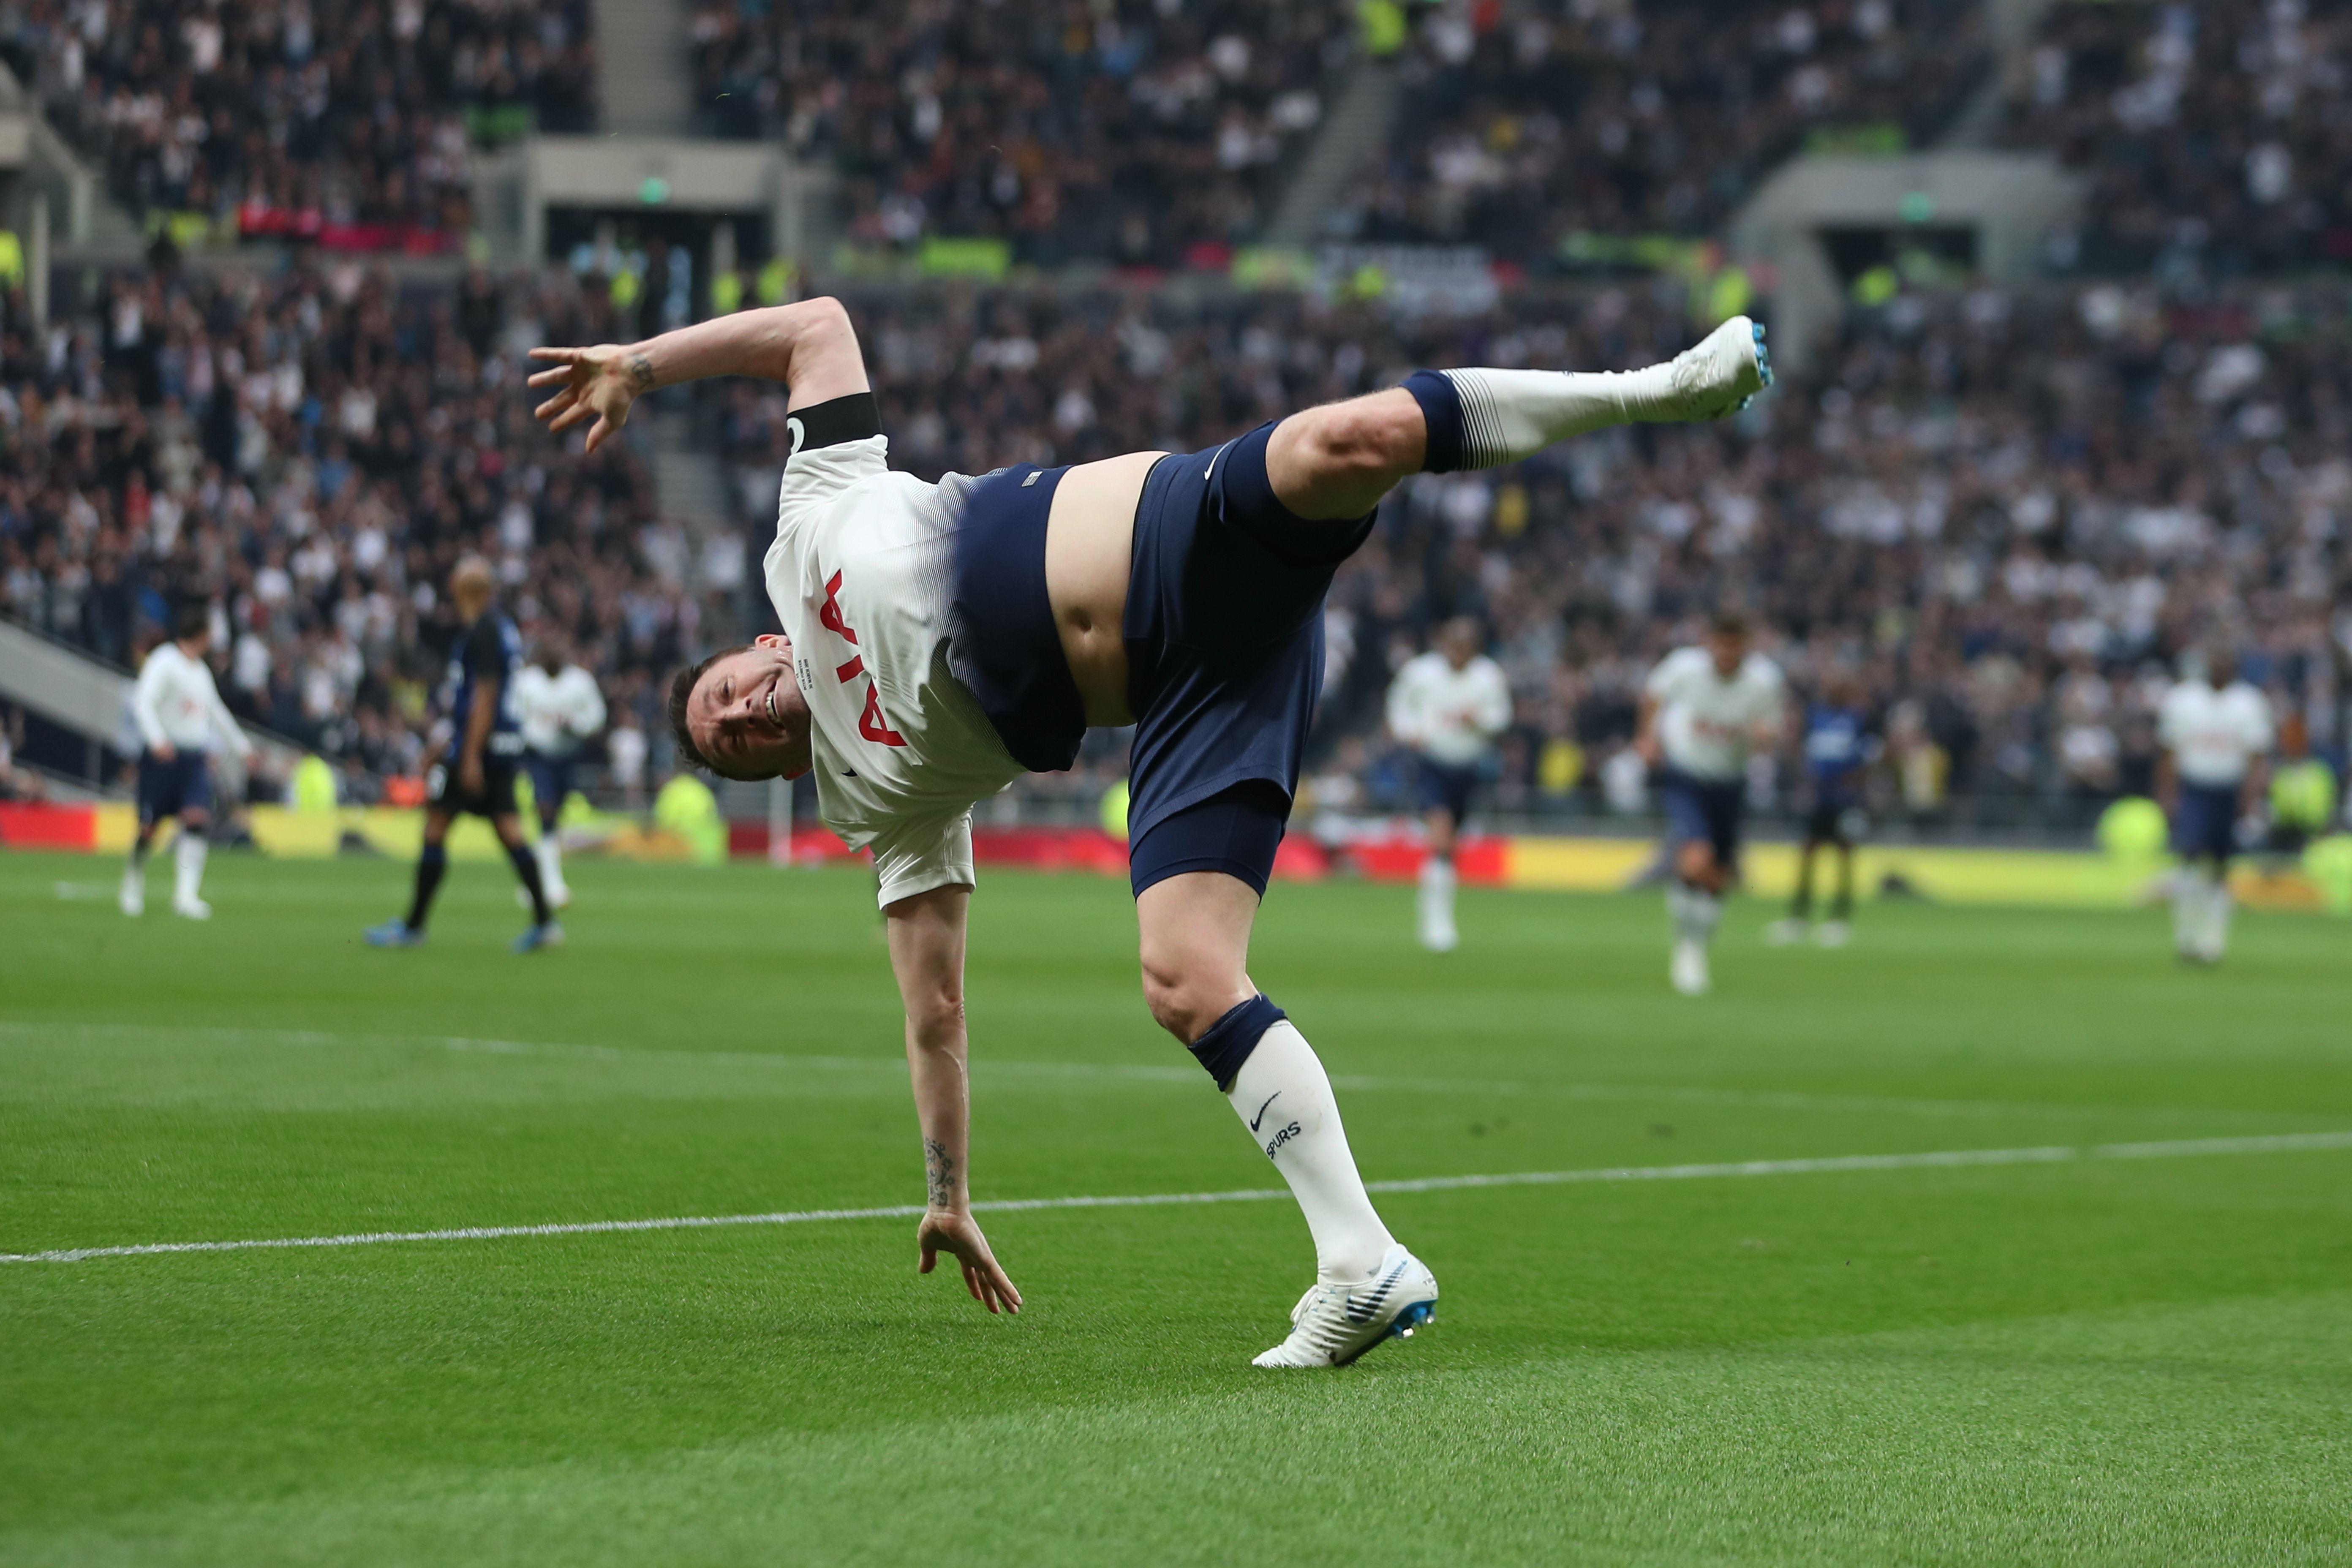 Robbie Keane - Tottenham Hotspur 2019